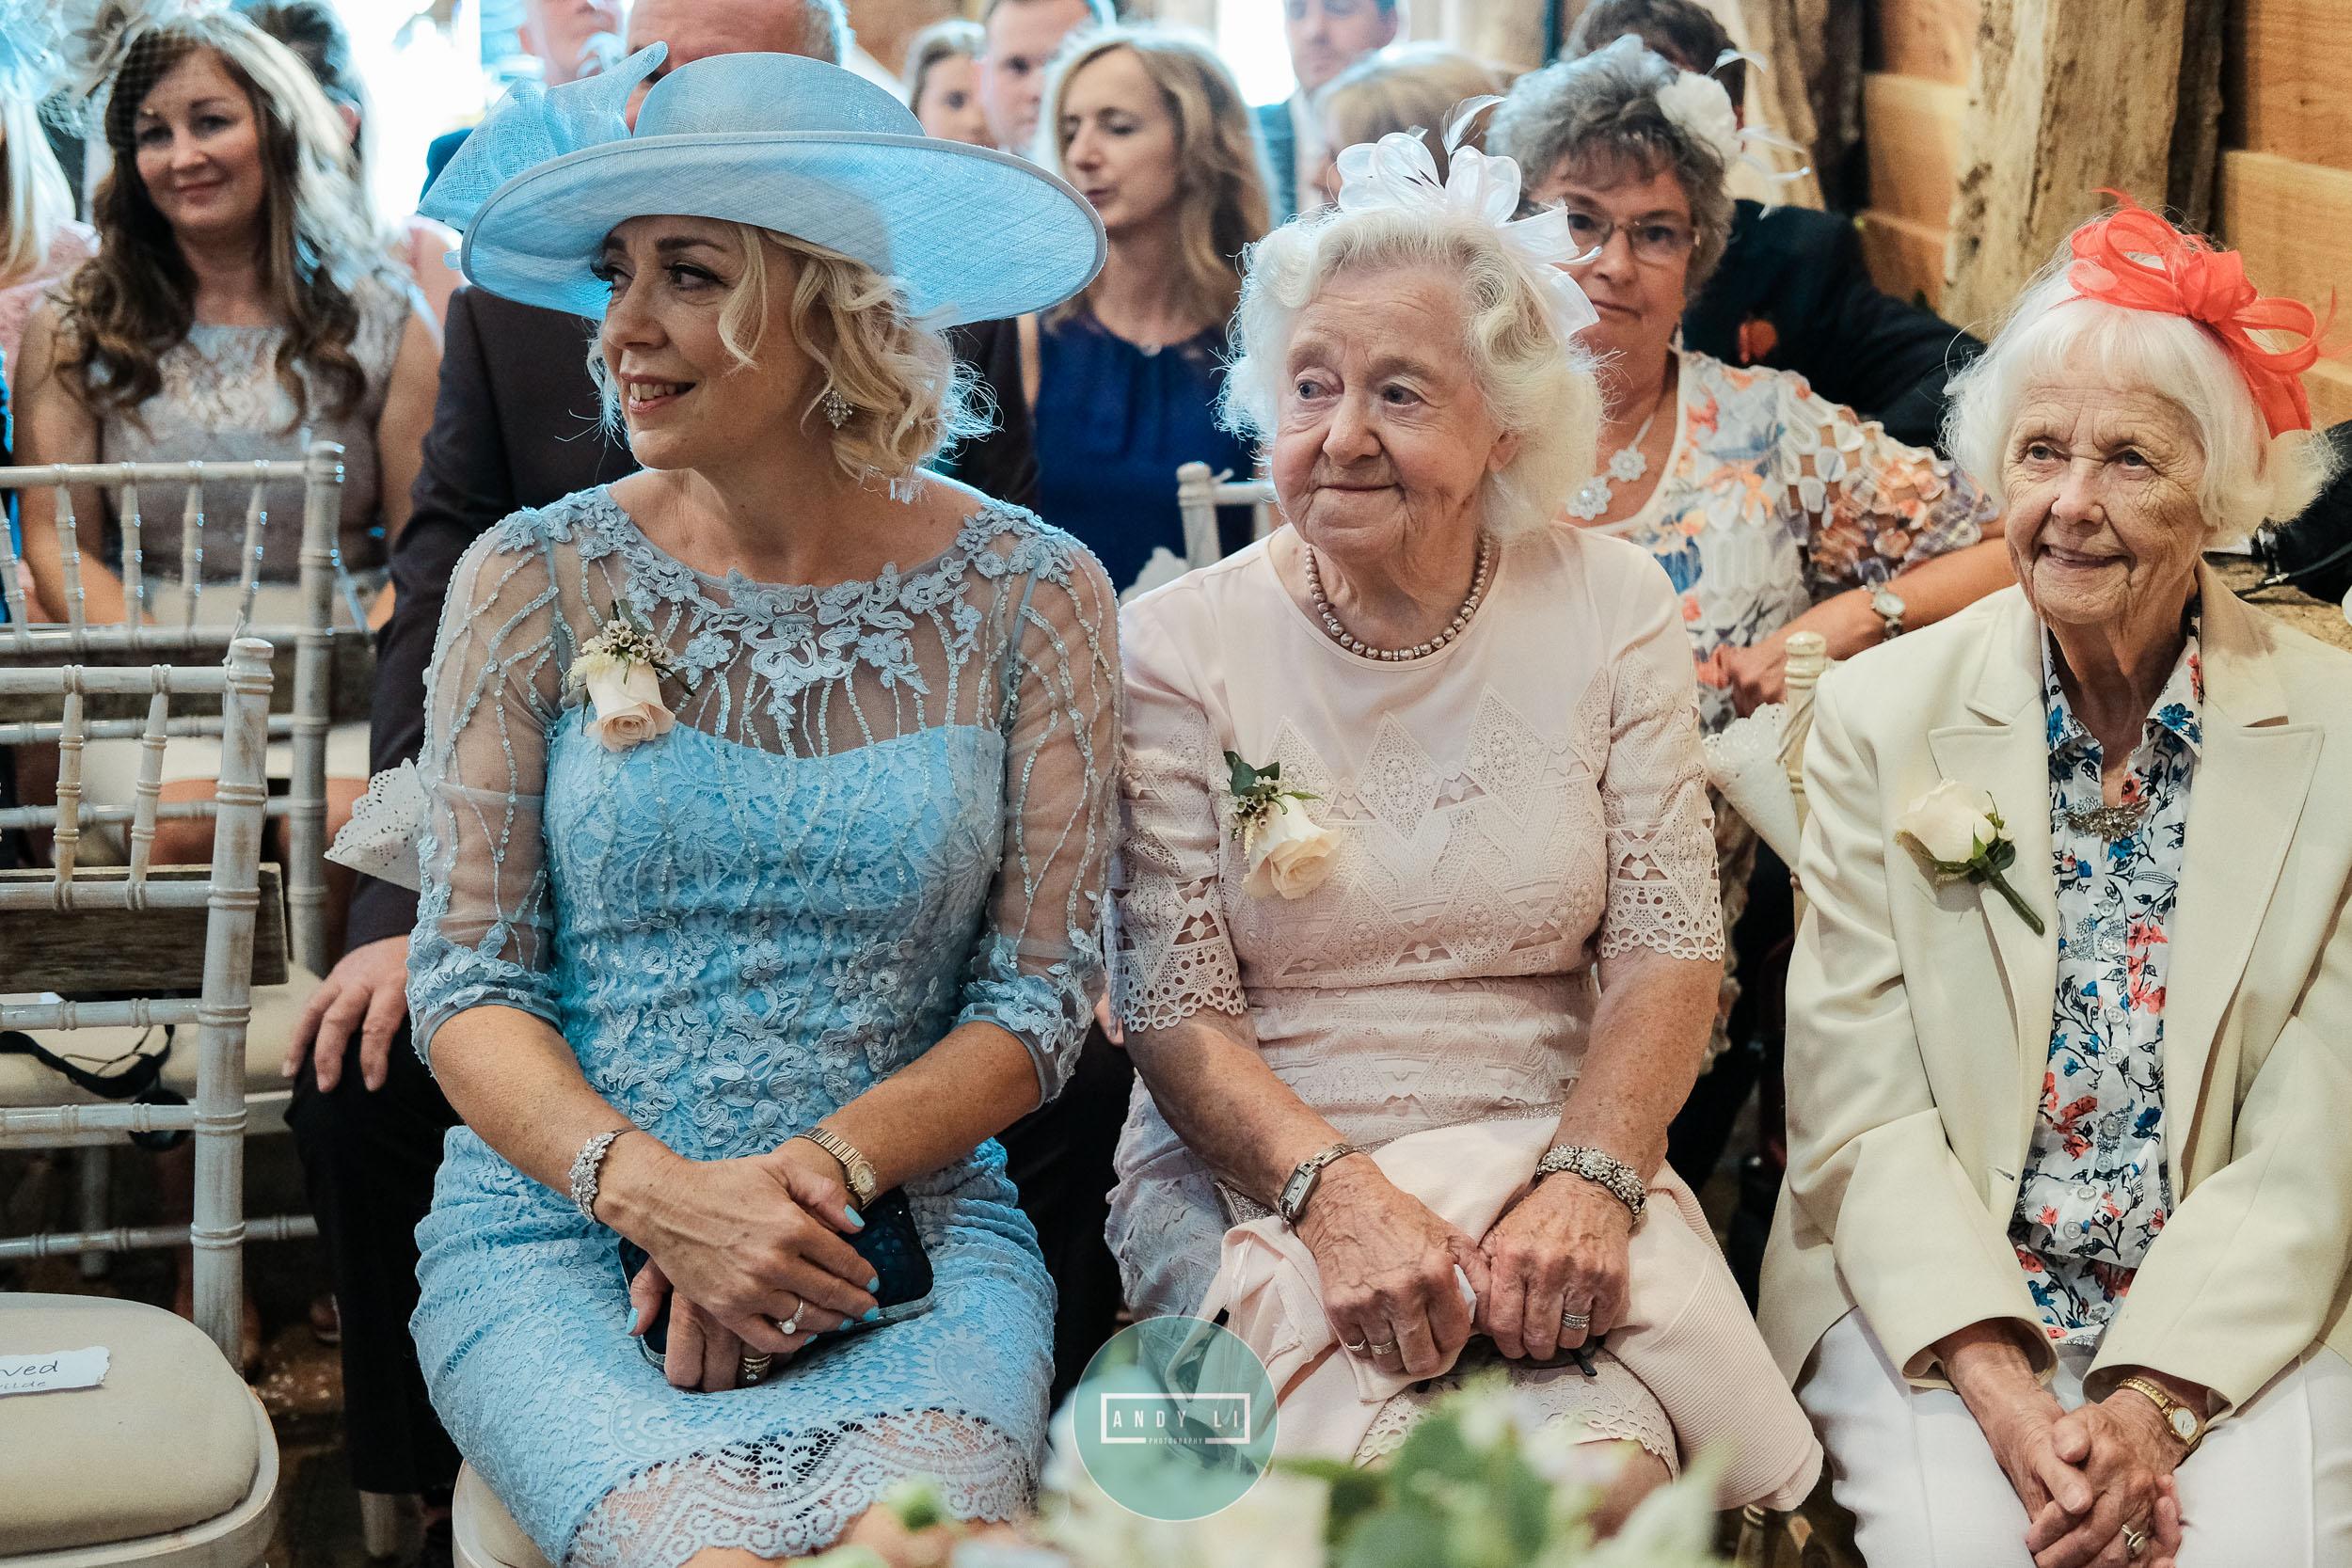 Pimhill Barn Wedding Photographer-053-DSCF0069.jpg